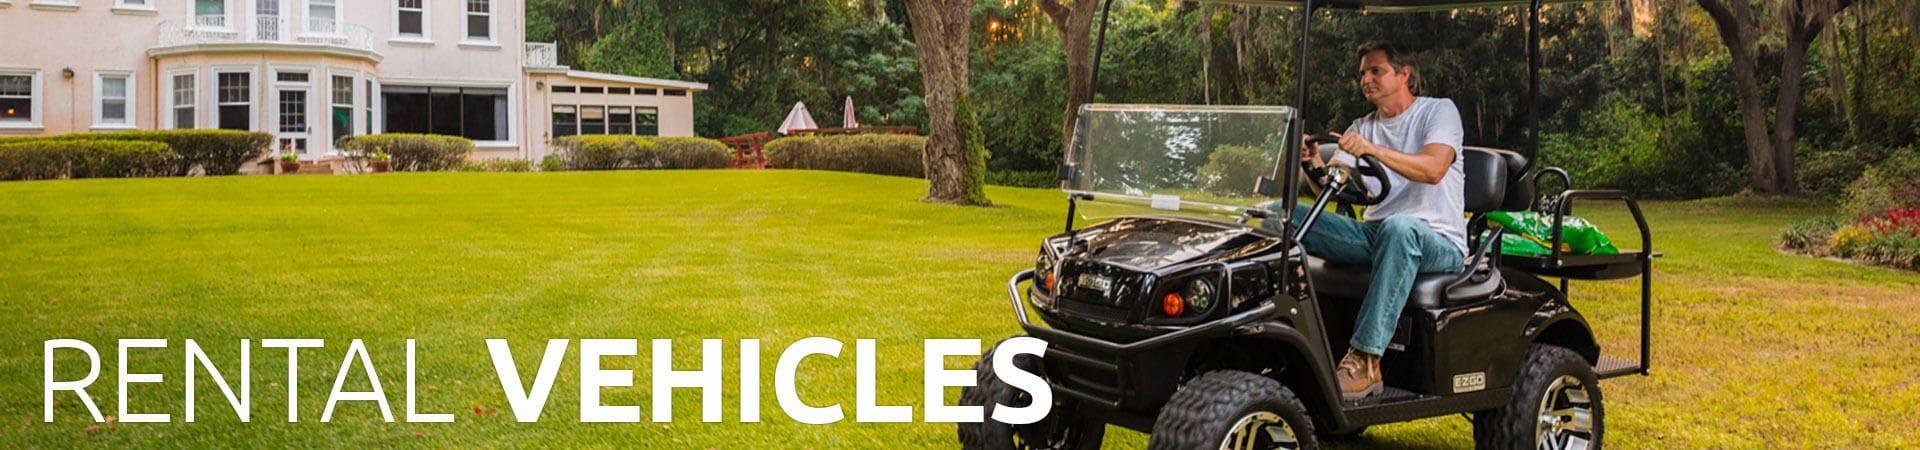 Rental Vehicles | Golf Car World